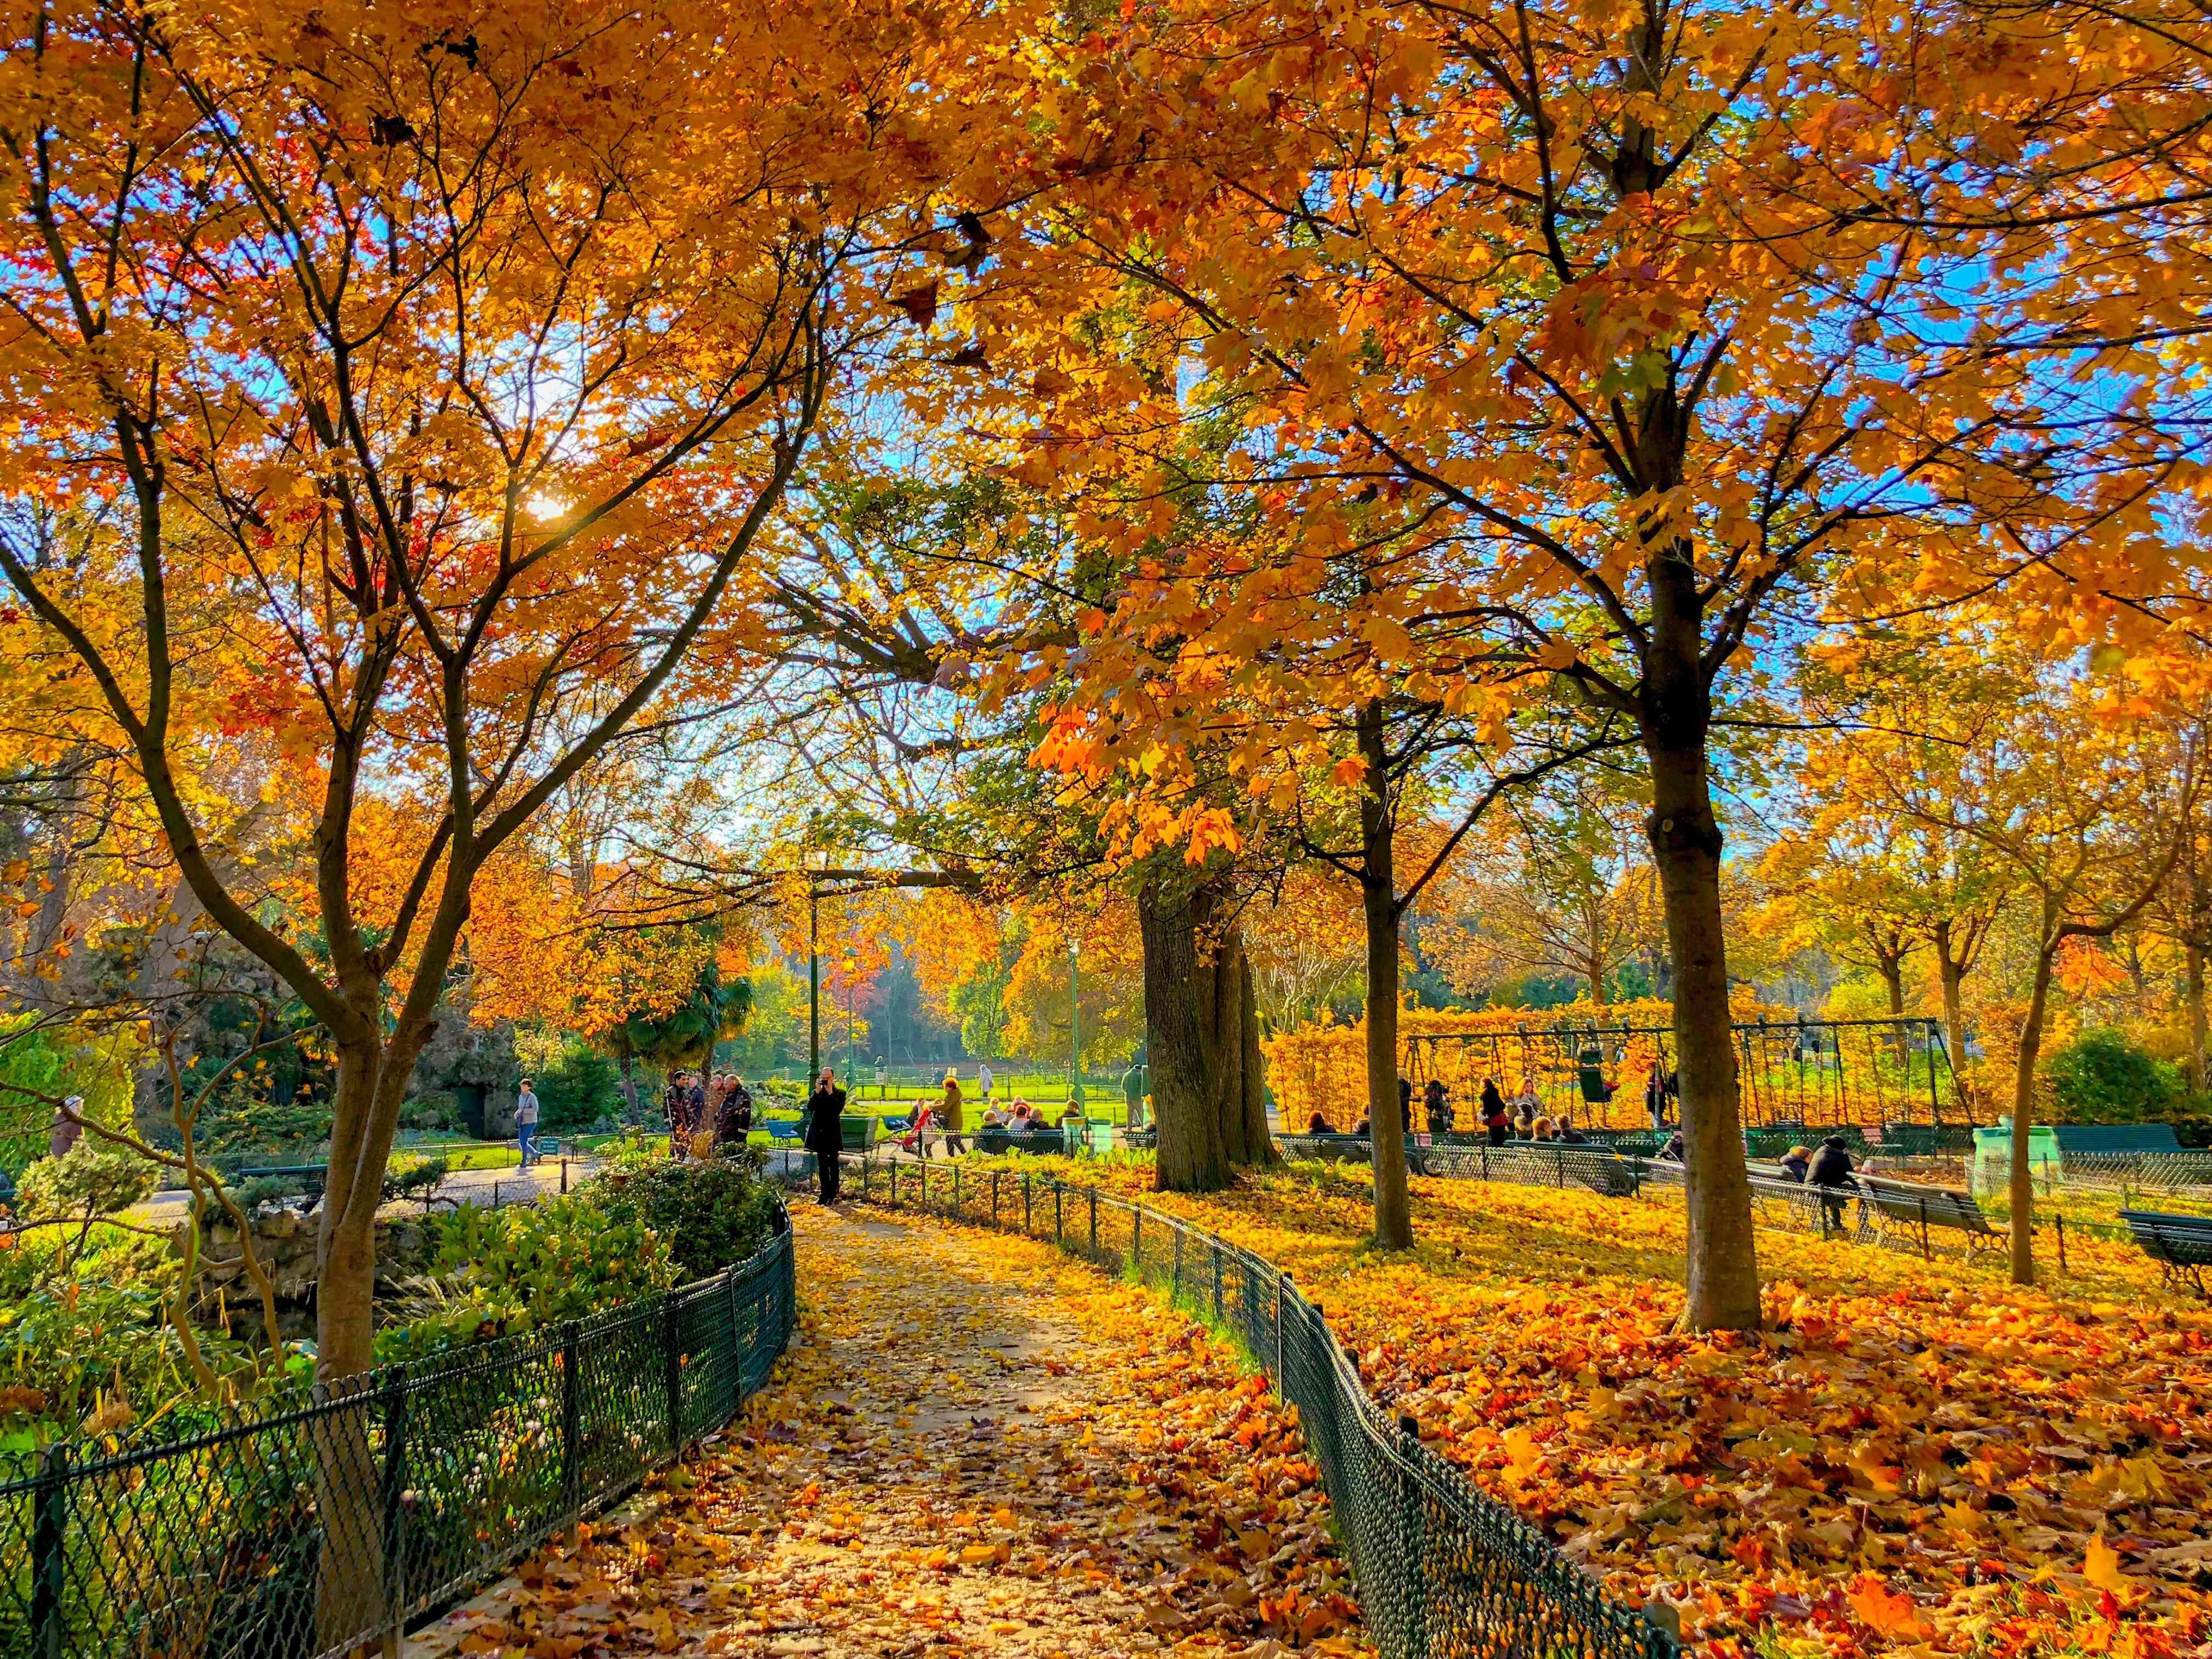 Autumn Trees In Park Monceau